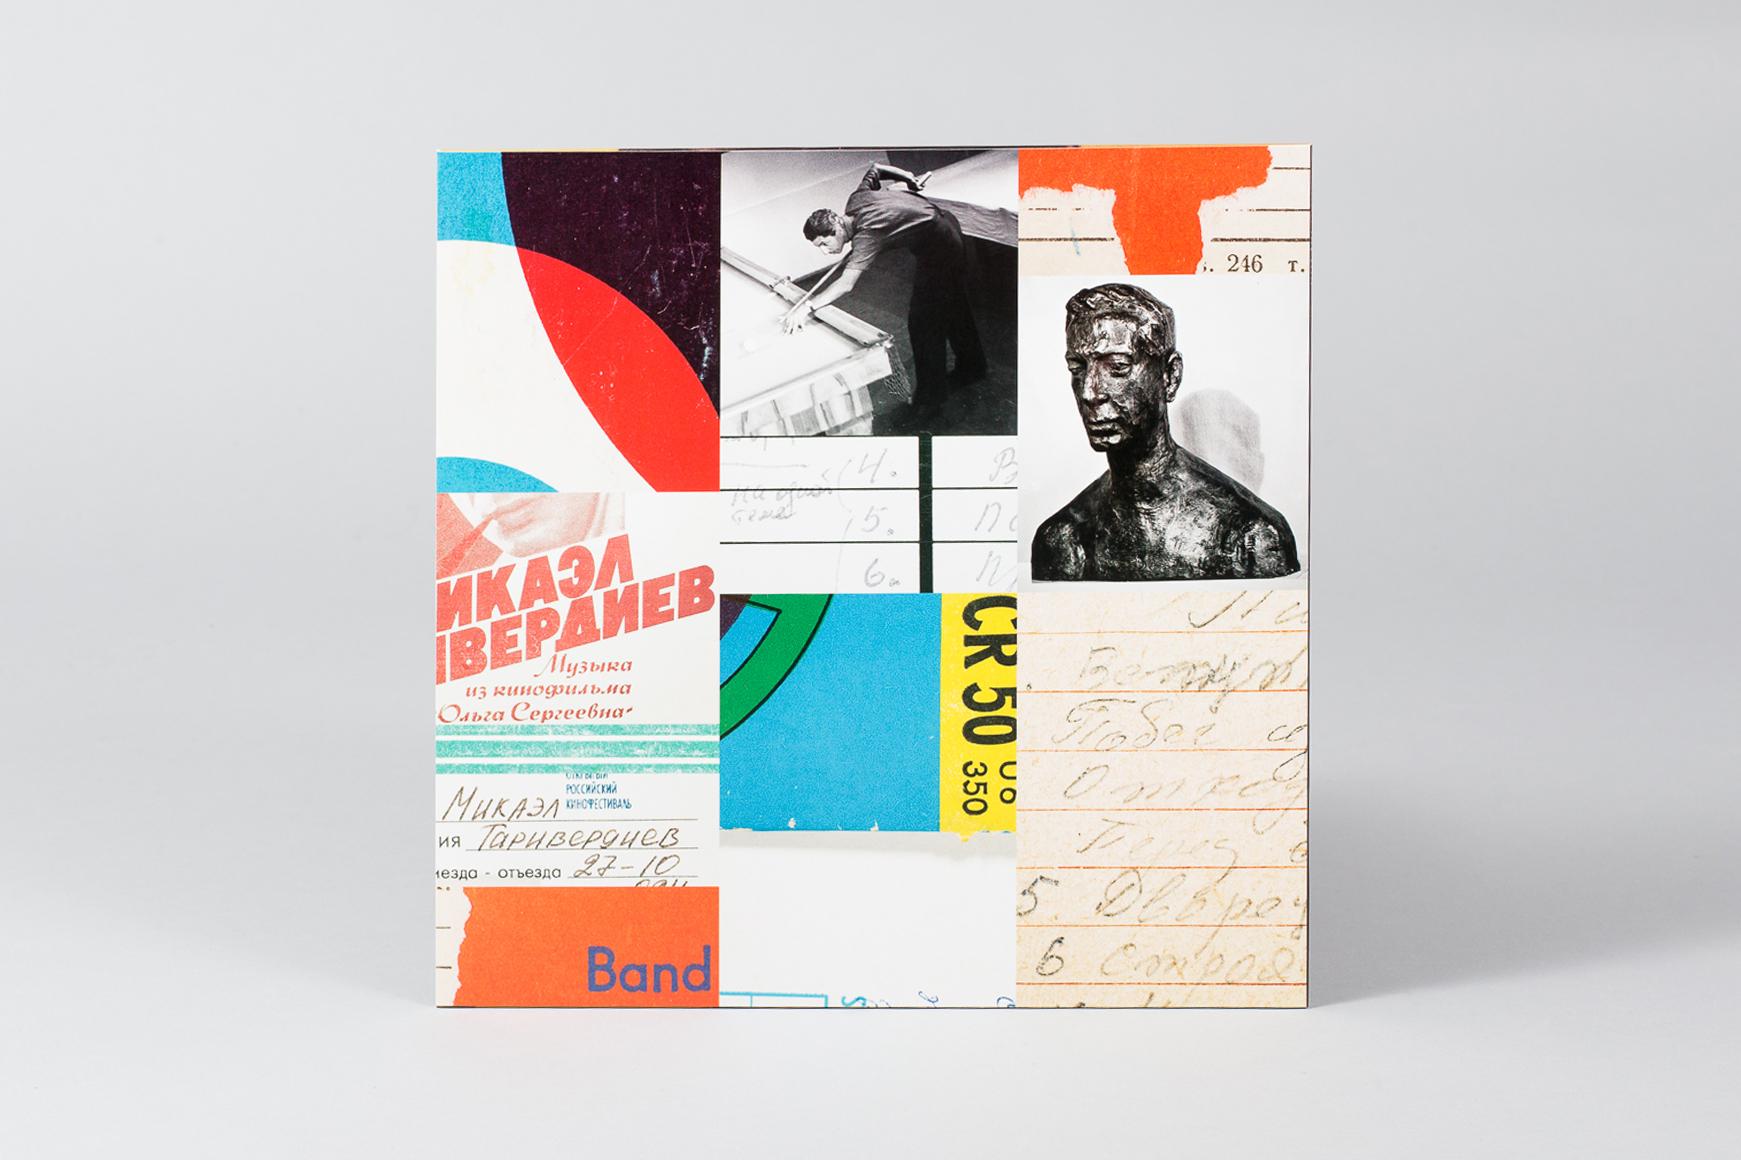 ©-The-Vinyl-Factory-Tariverdiev-Vinyl-Release-Photography-Michael-Wilkin_0007_1-7-of-30.jpg